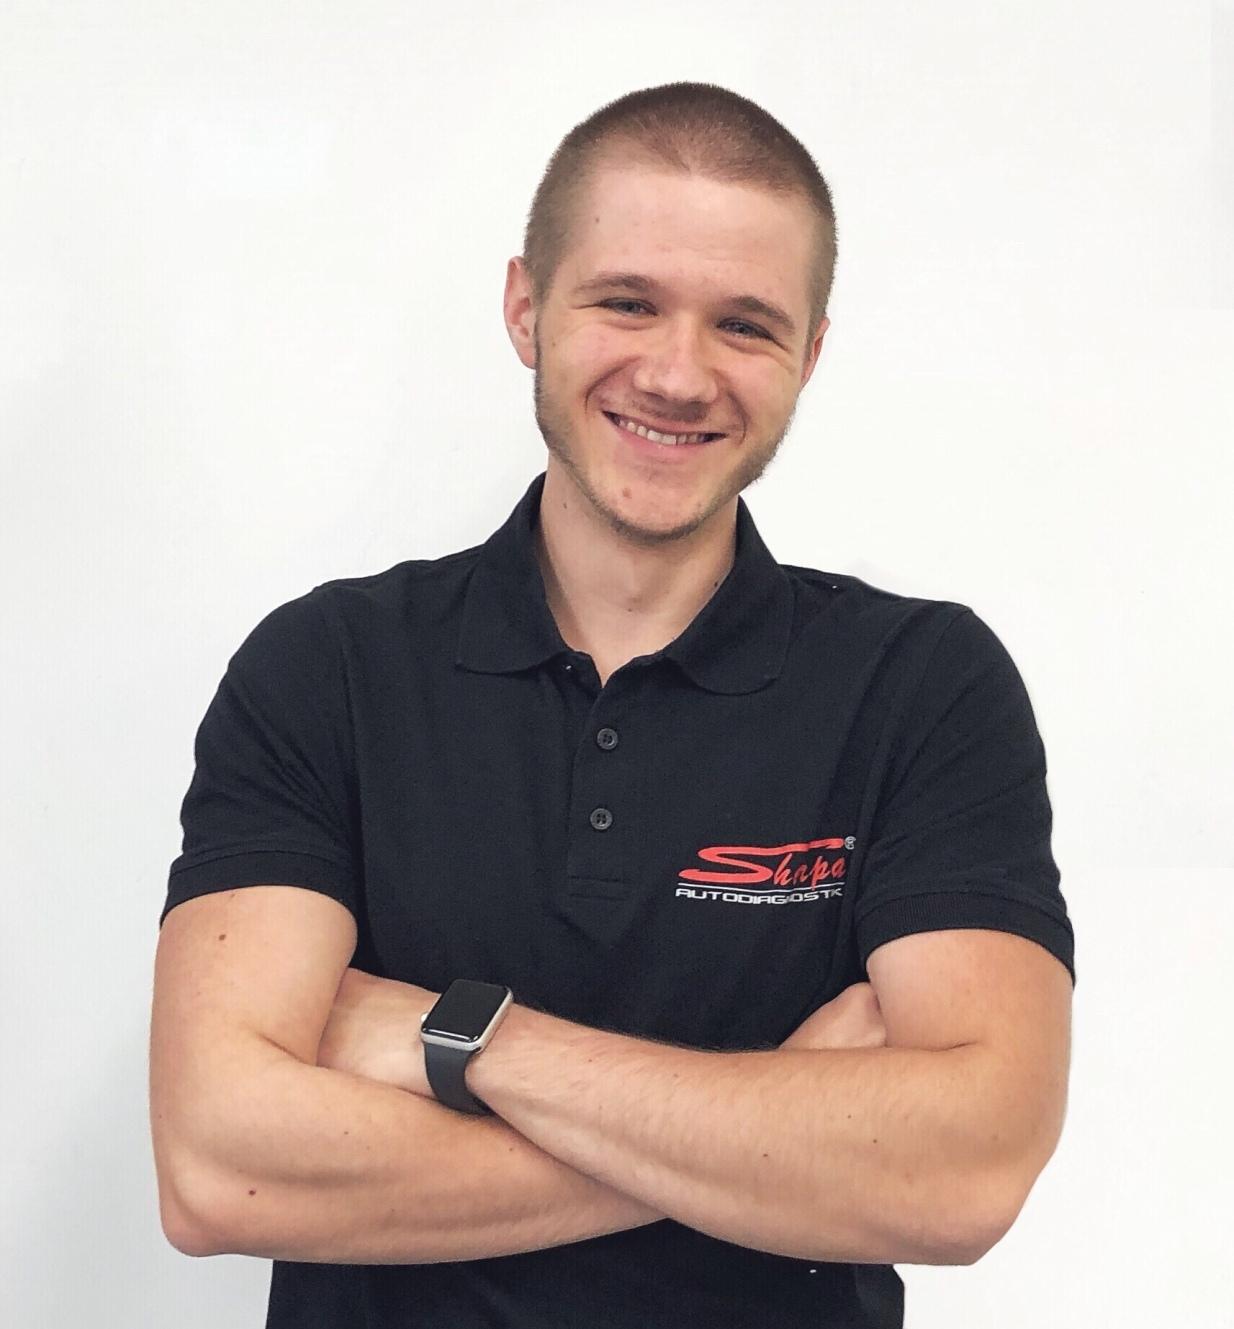 New employee Manuel Lainer